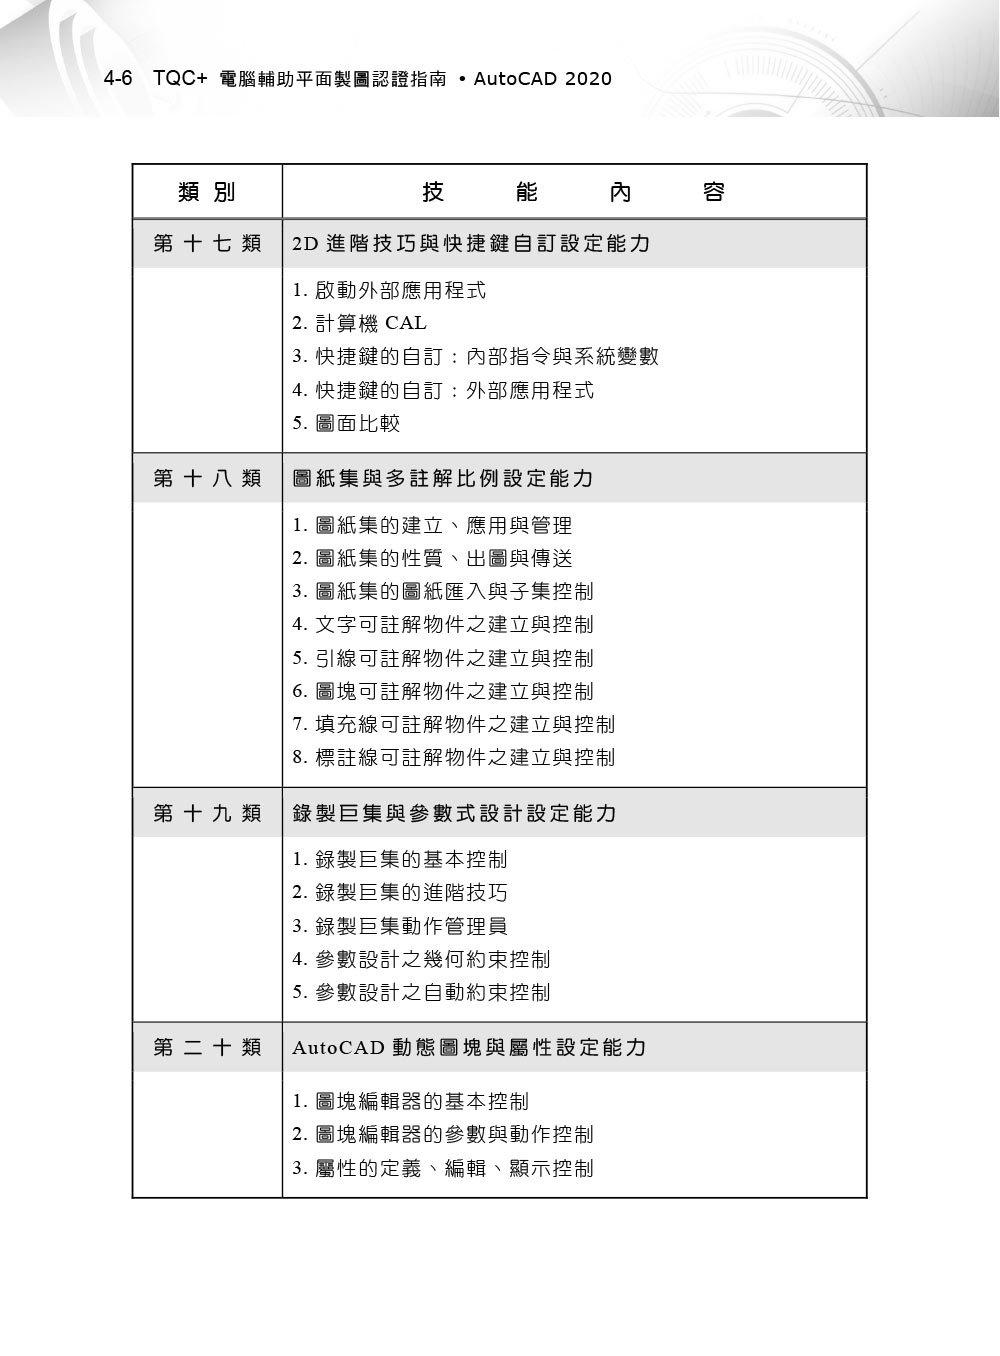 TQC+ 電腦輔助平面製圖認證指南 AutoCAD 2020-preview-6